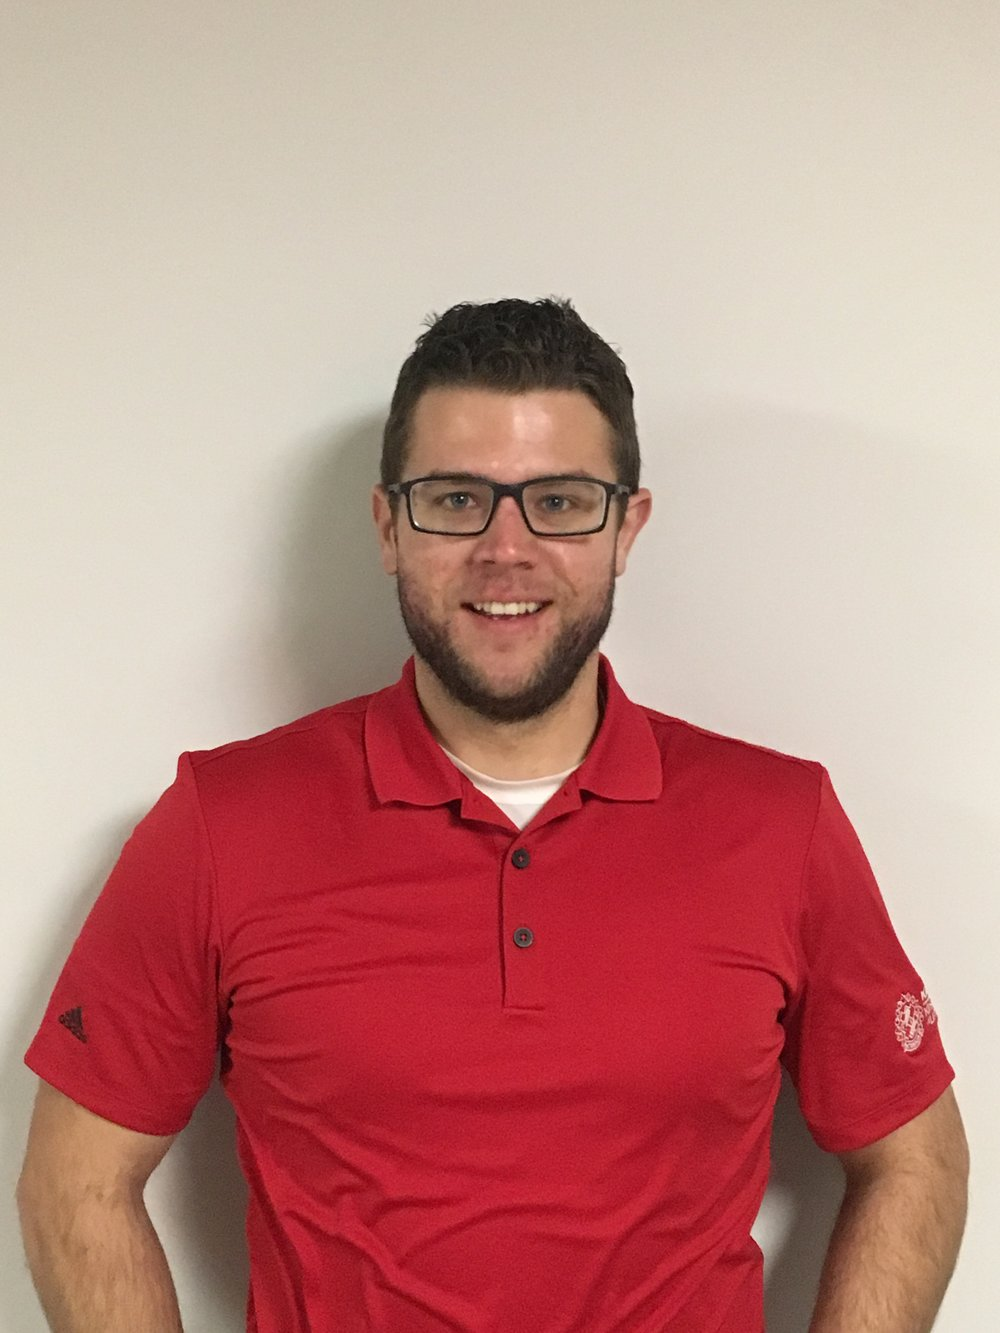 Kurt Forrest General Member, 2nd year Kinsmen Sales Rep at Bowman Sales & Associates